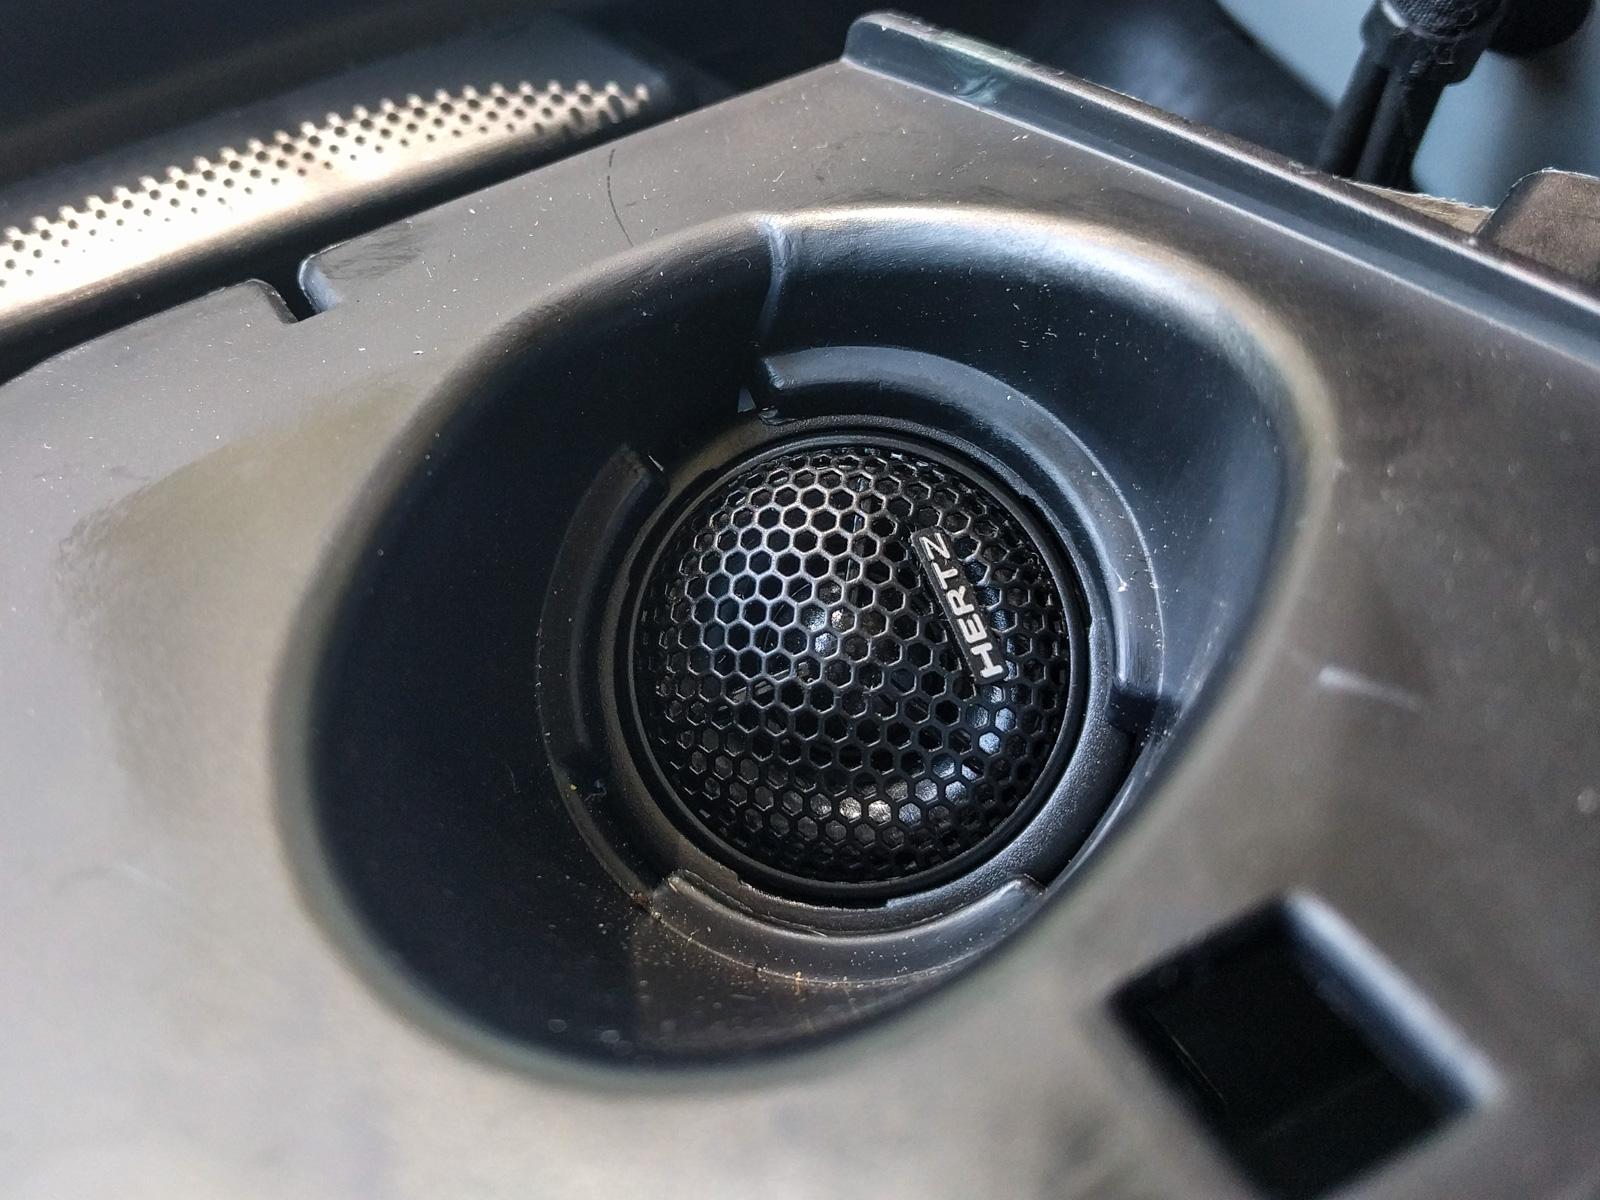 How To Replace Sprinter Door And Dash Speakers Adventure Van 2013 Mb Wiring Diagram Pull The Tweeter Wire Through Underside Of Surround Then Crimp On